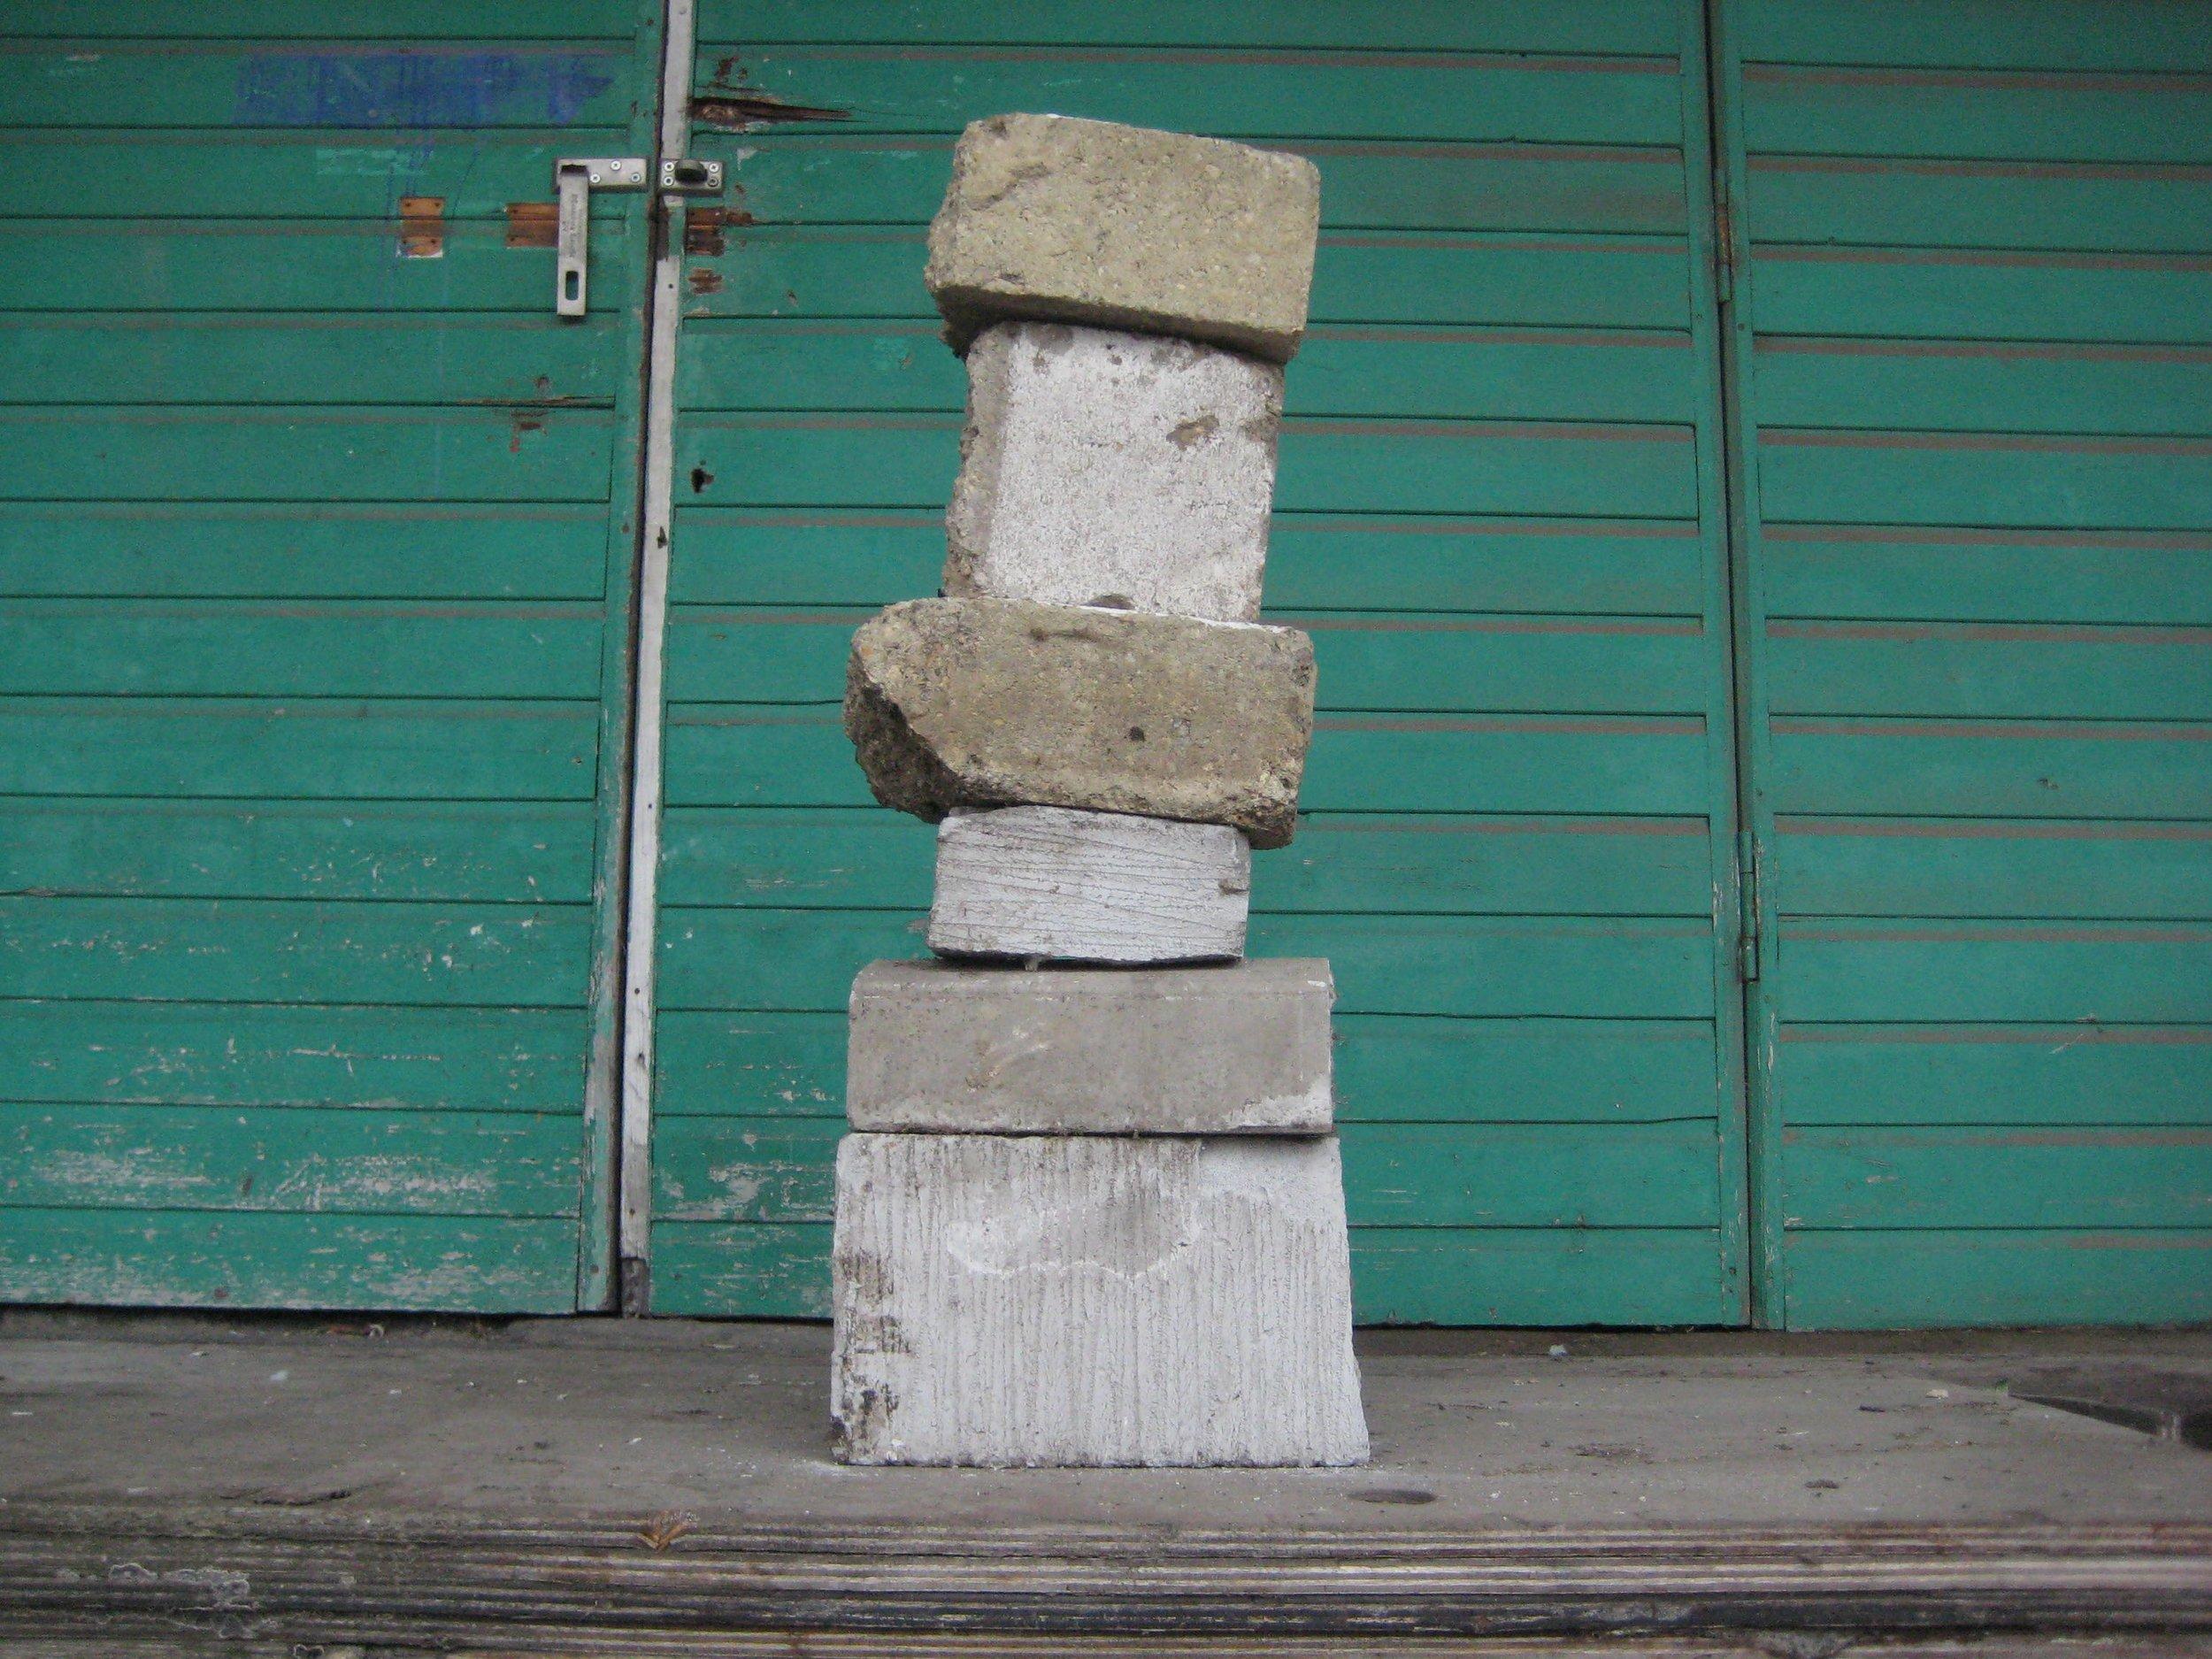 LXVIII Rubble sculpture 17 (adapted x 3).jpg